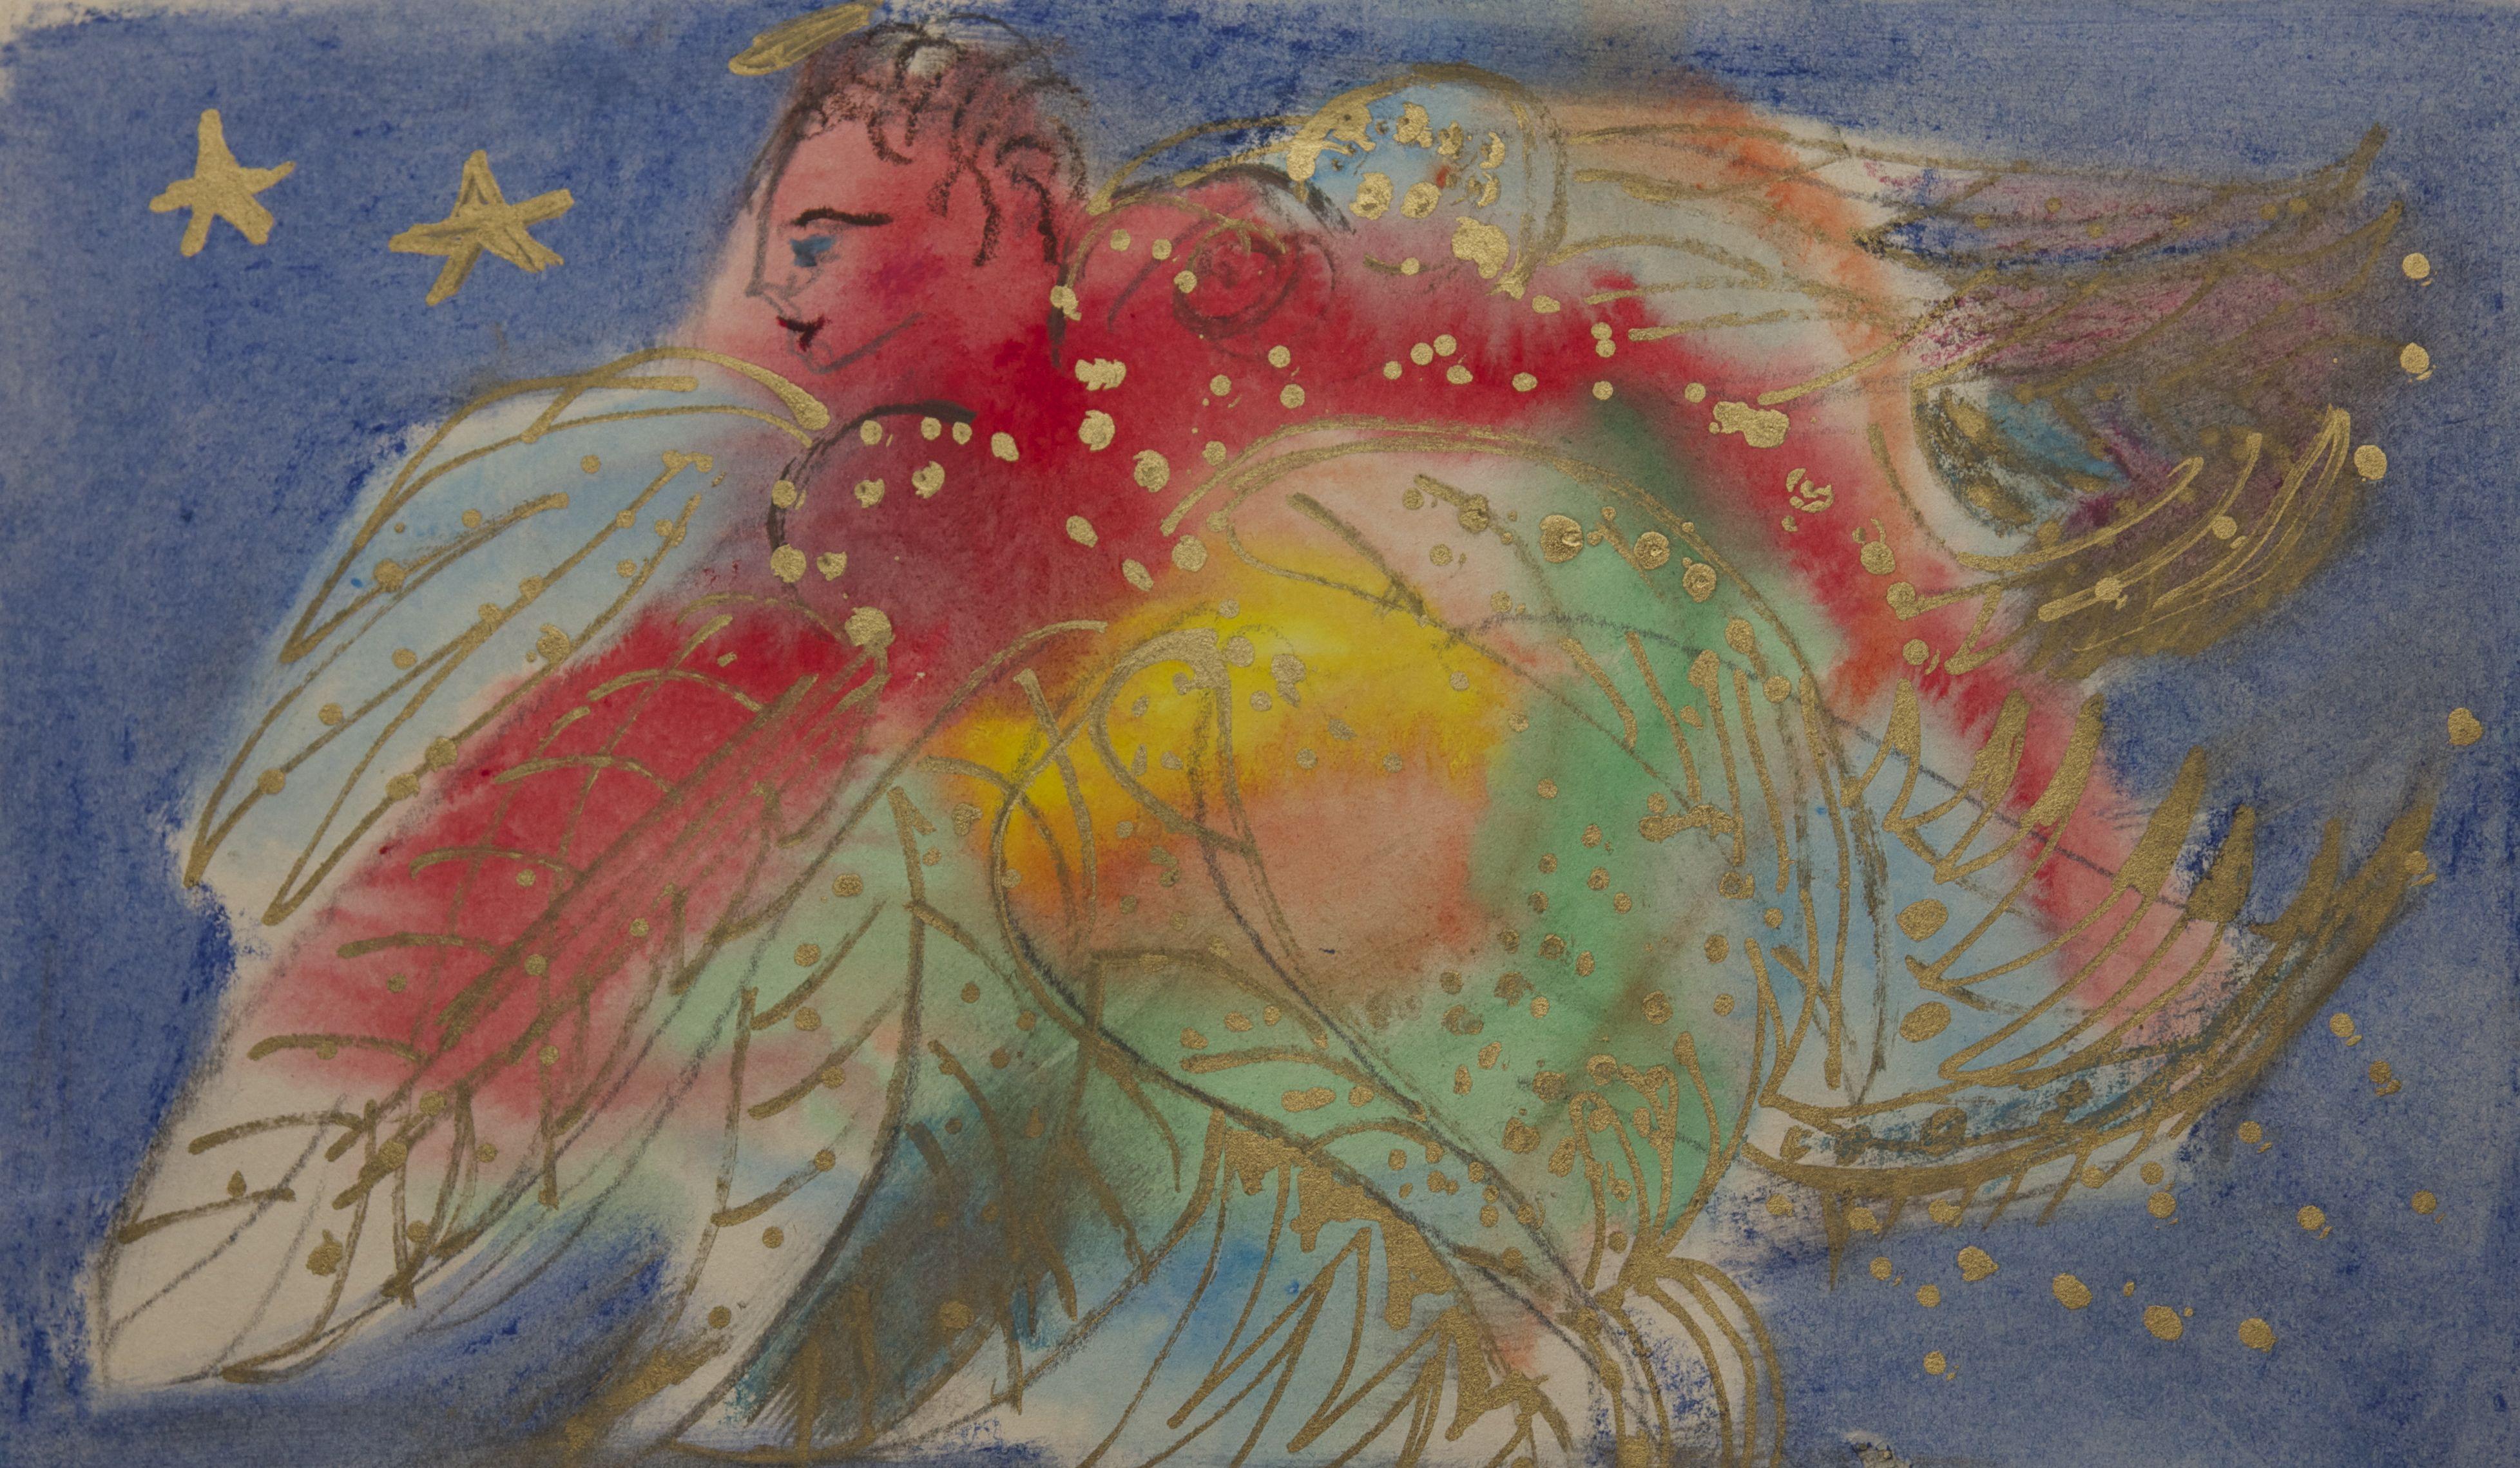 ANGEL OF PURPOSEFUL INTENT